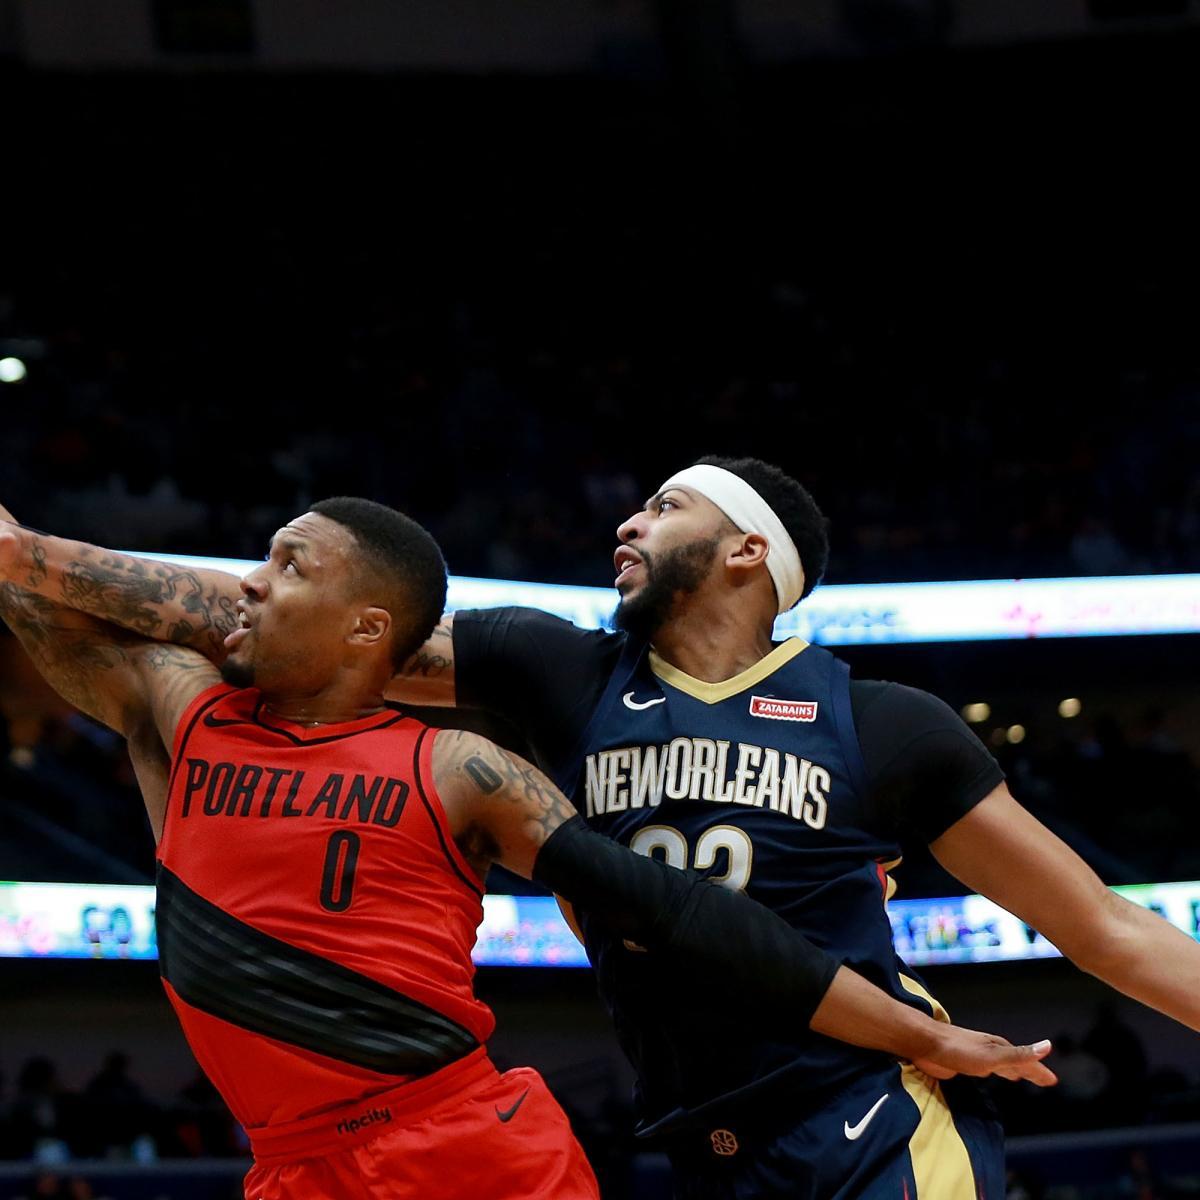 NBA Playoff Bracket 2018: Full Review Of Postseason